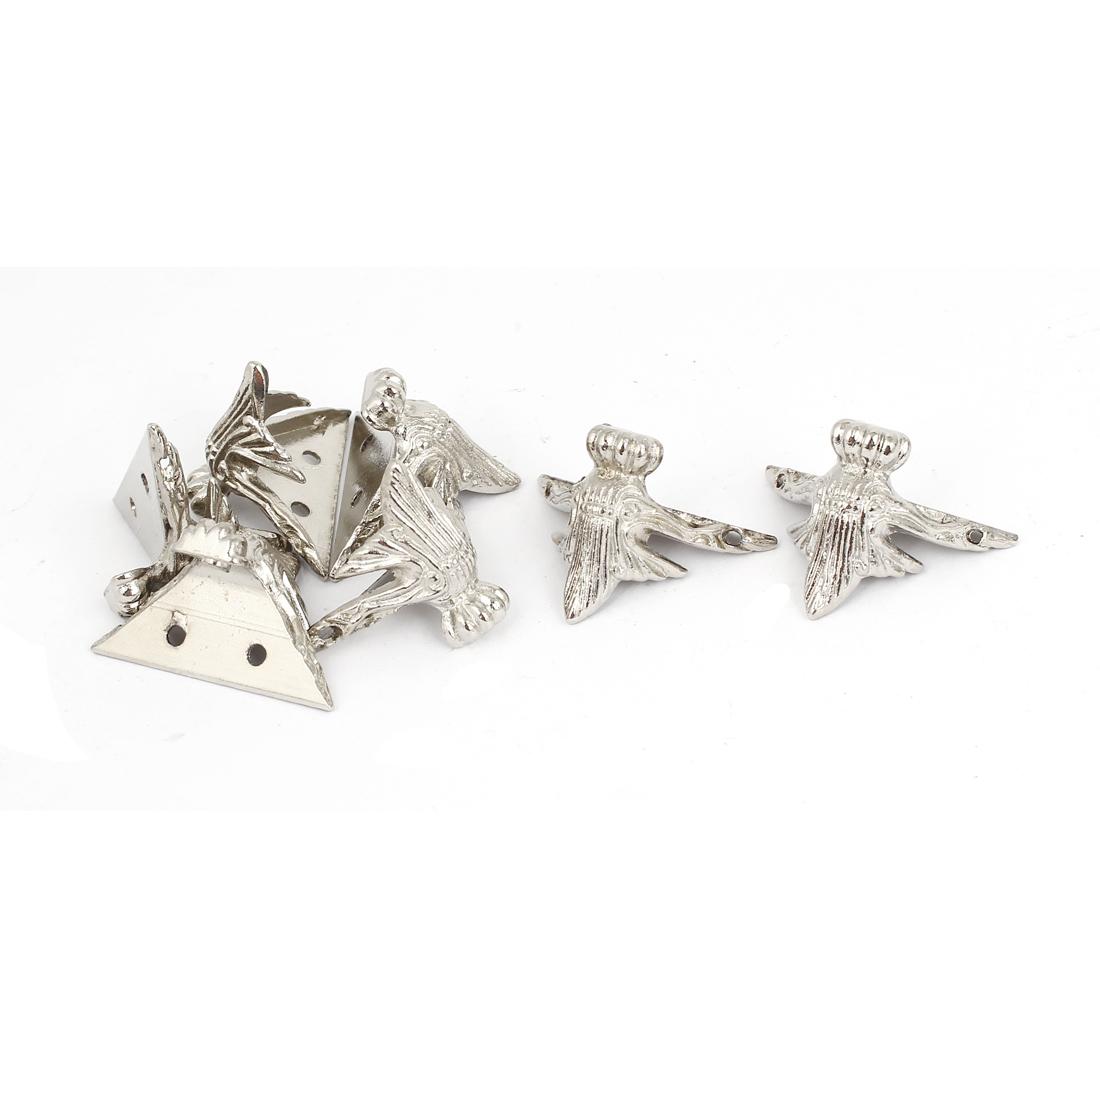 32mmx32mm Jewelry Gift Box Antique Corner Protector Guard Silver Tone 8pcs